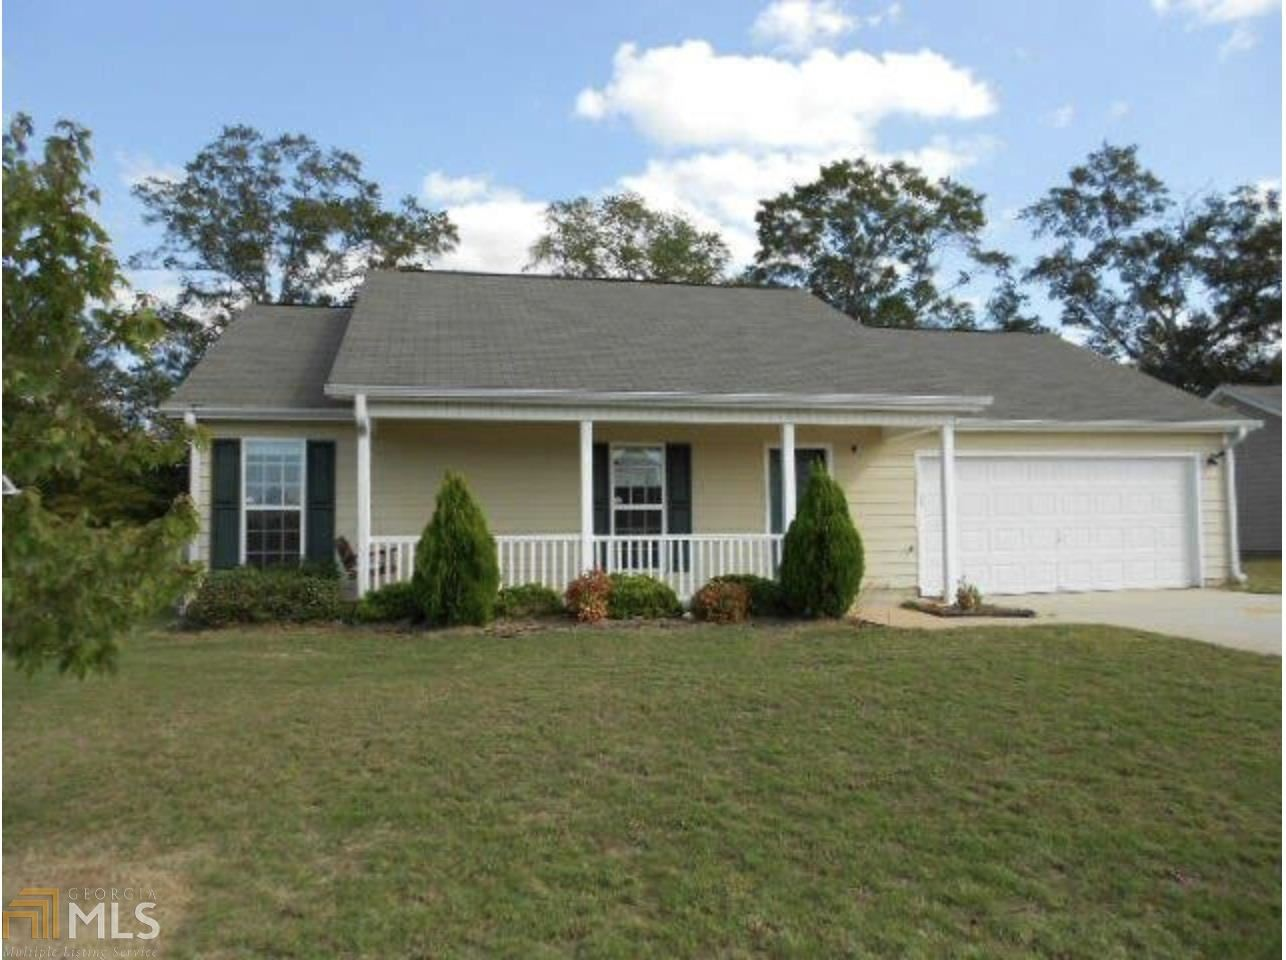 194 Cotton Dr, Jackson, GA 30233 - MLS#: 8915054